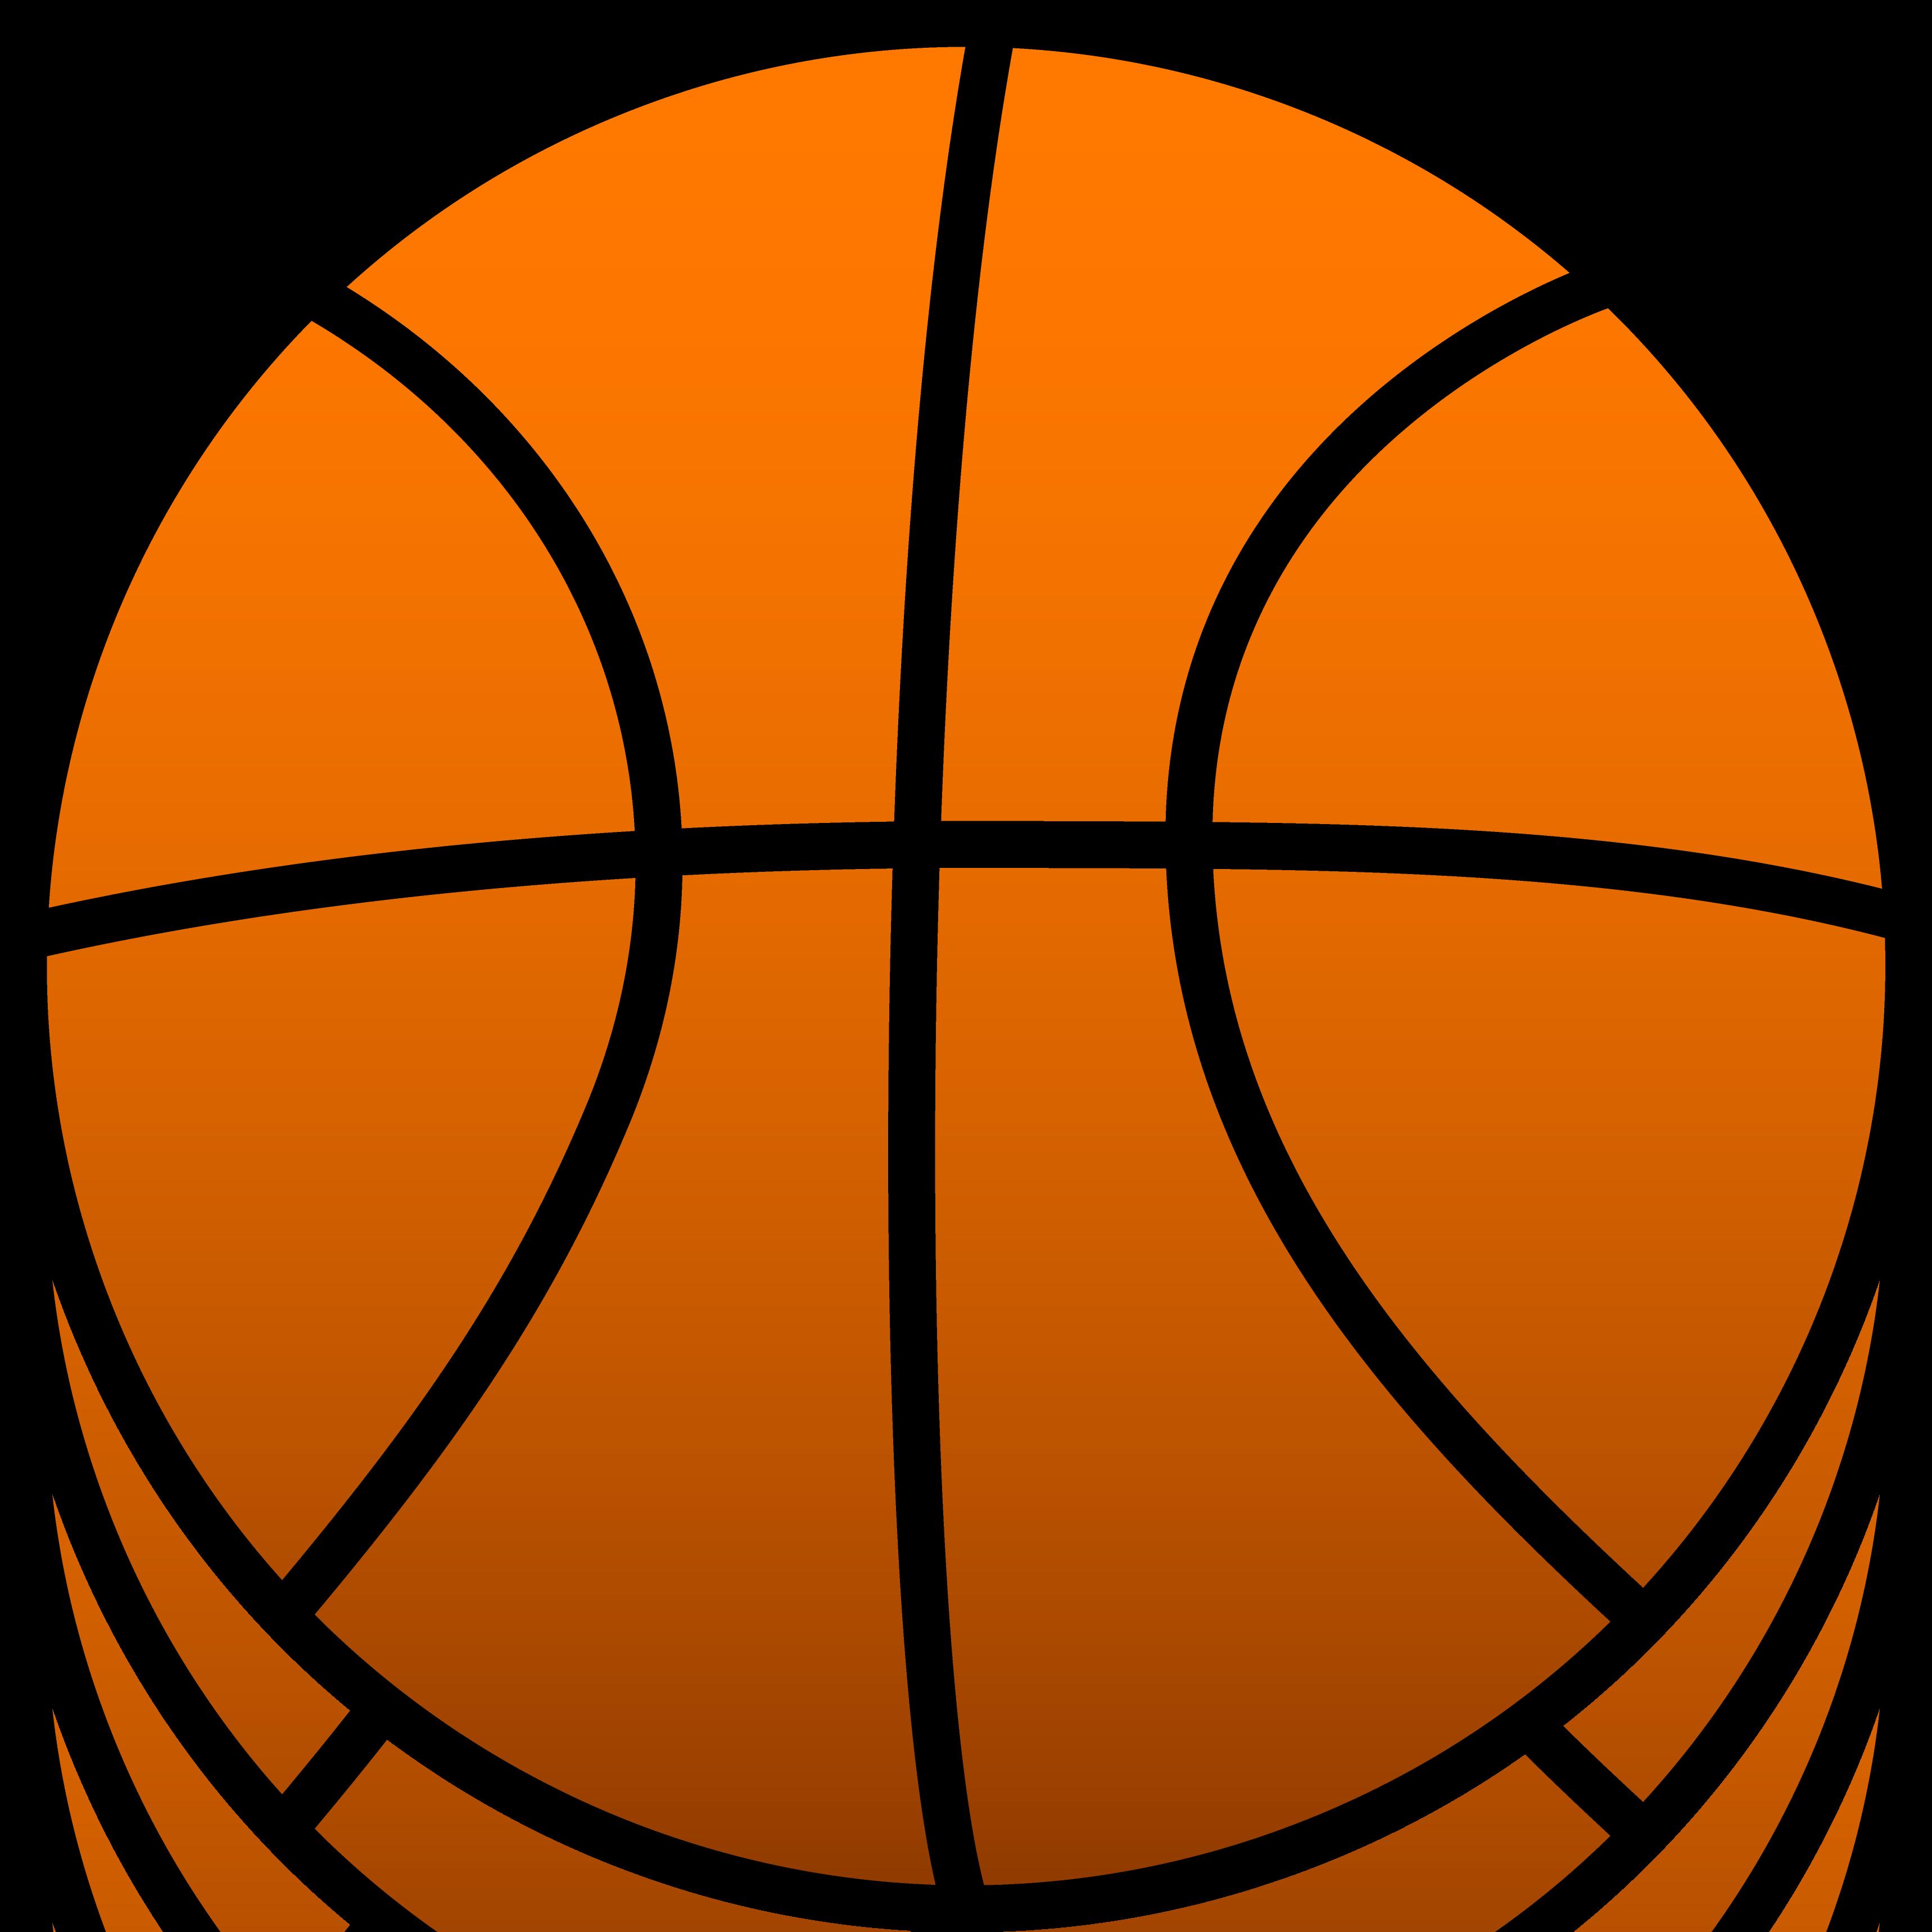 Dc everest girls basketball. Win clipart bedroom window